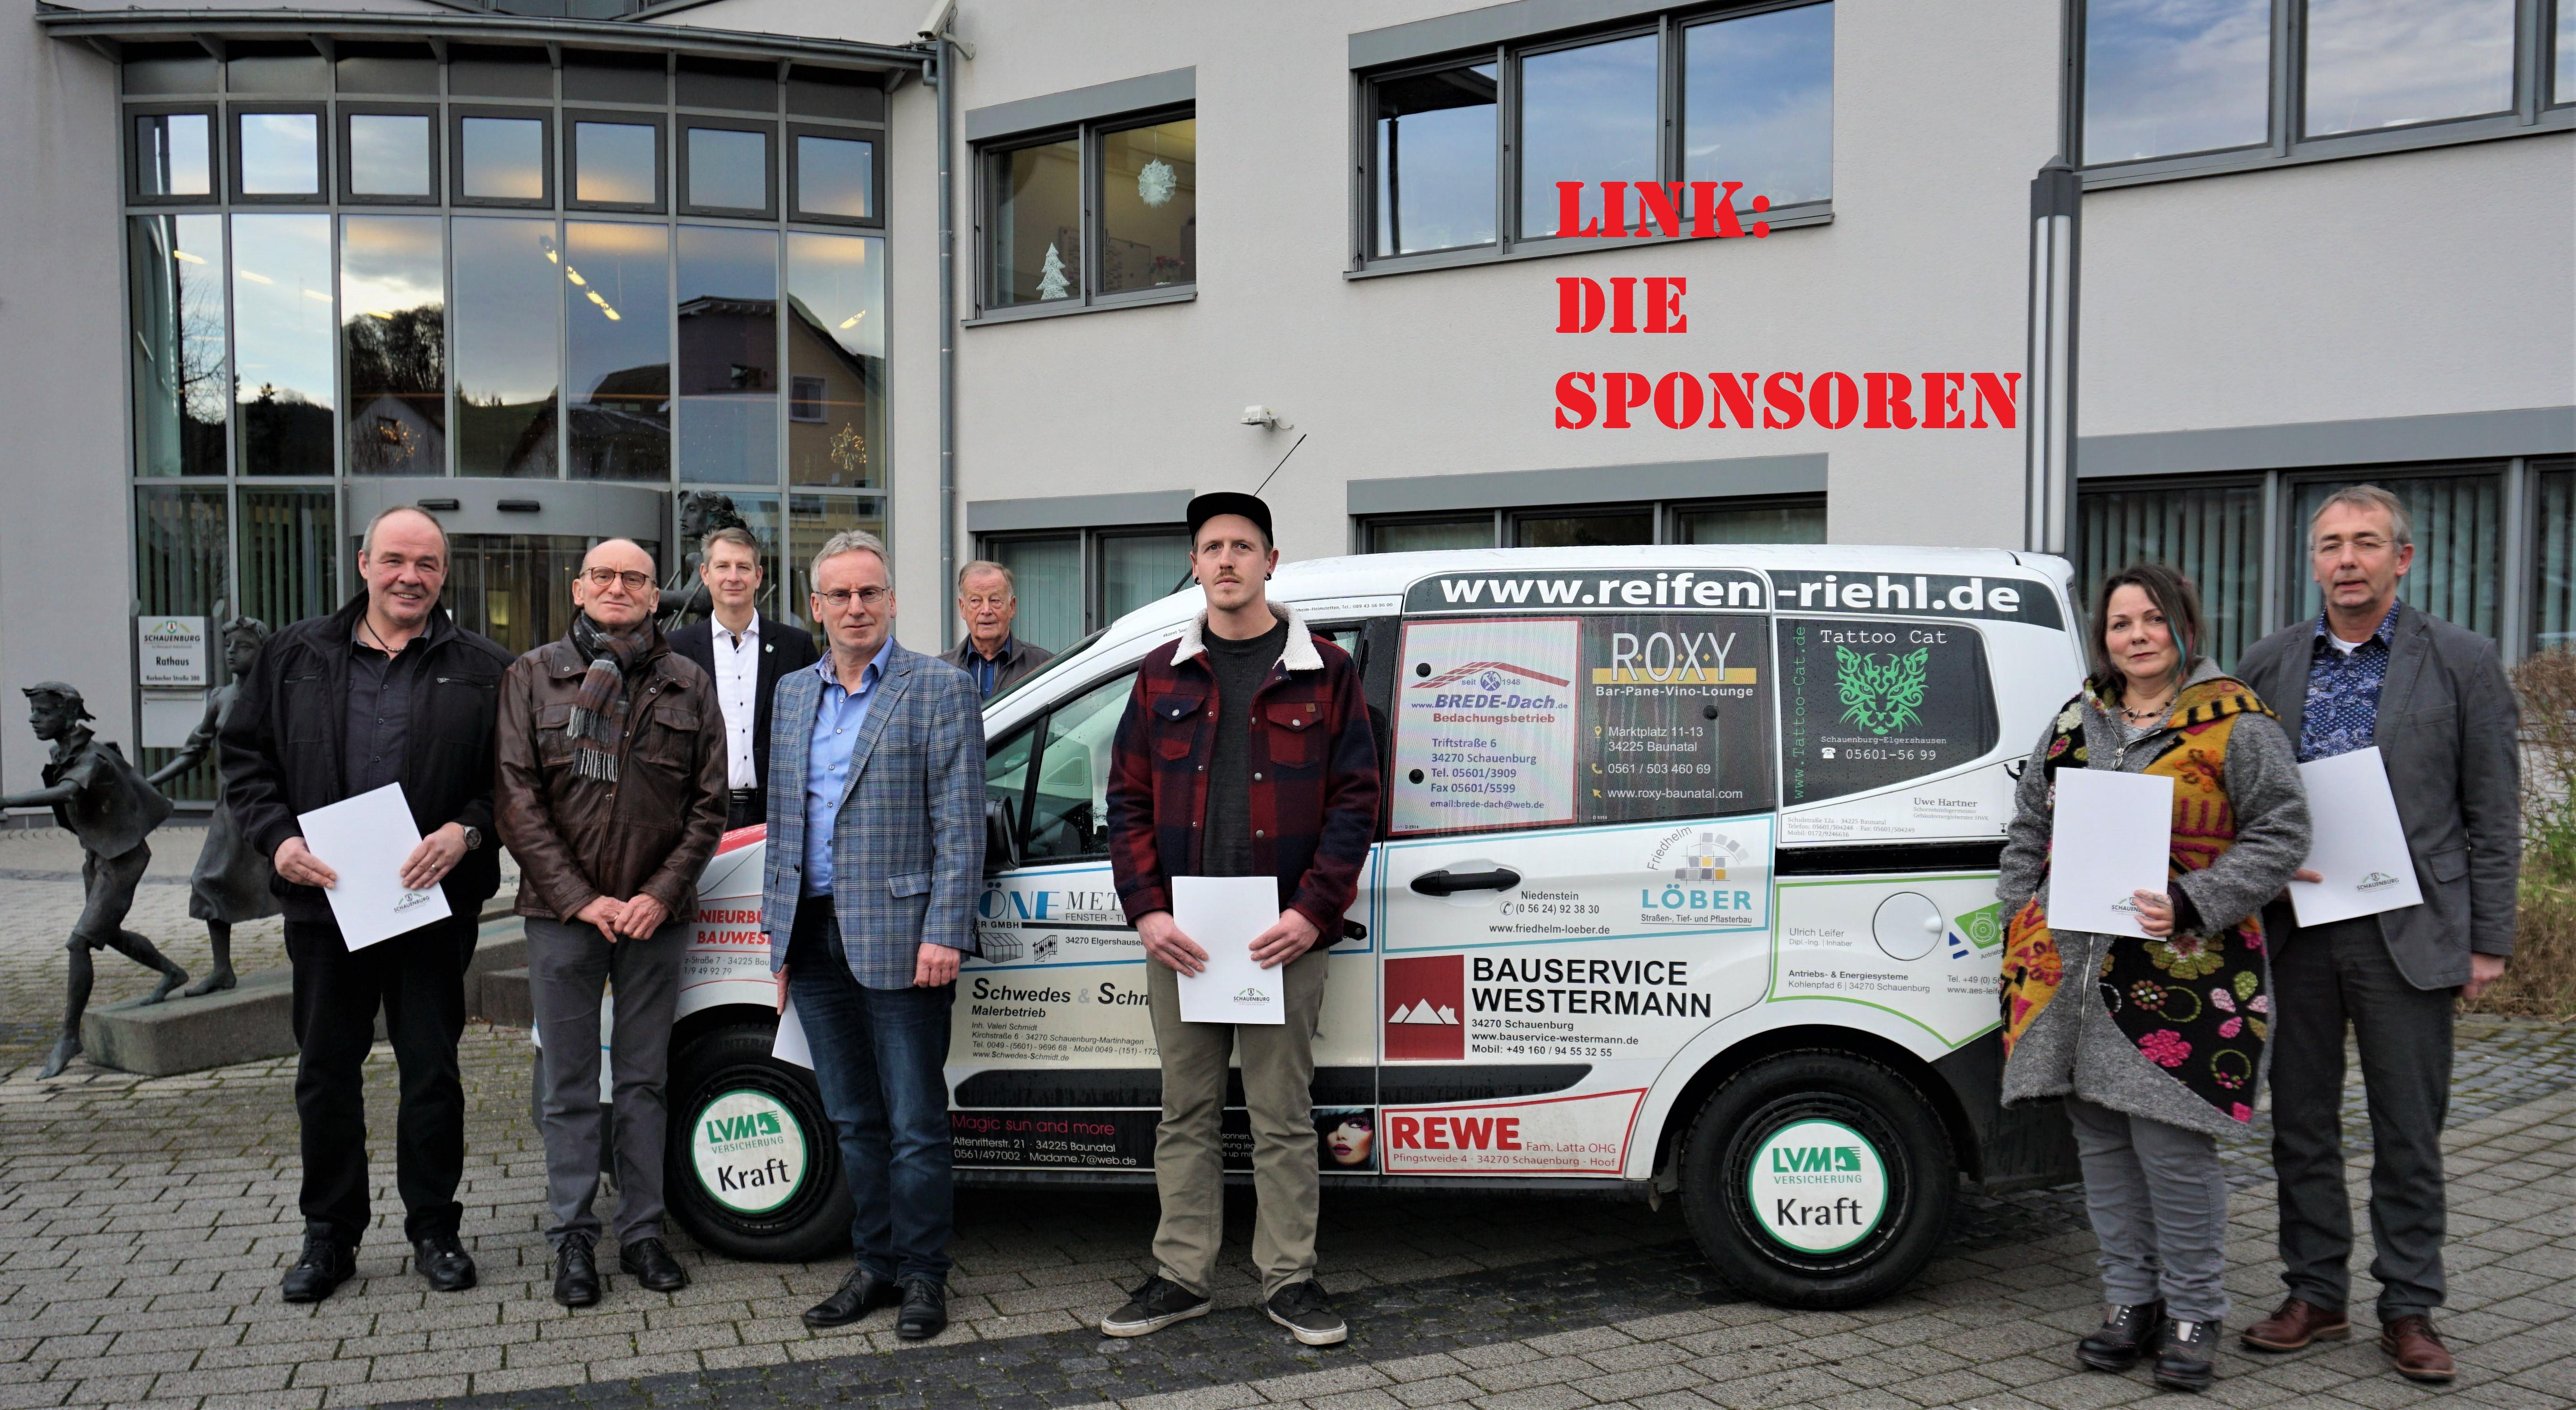 Sponsoren Kfz Gemeinde neu Dezember 2019